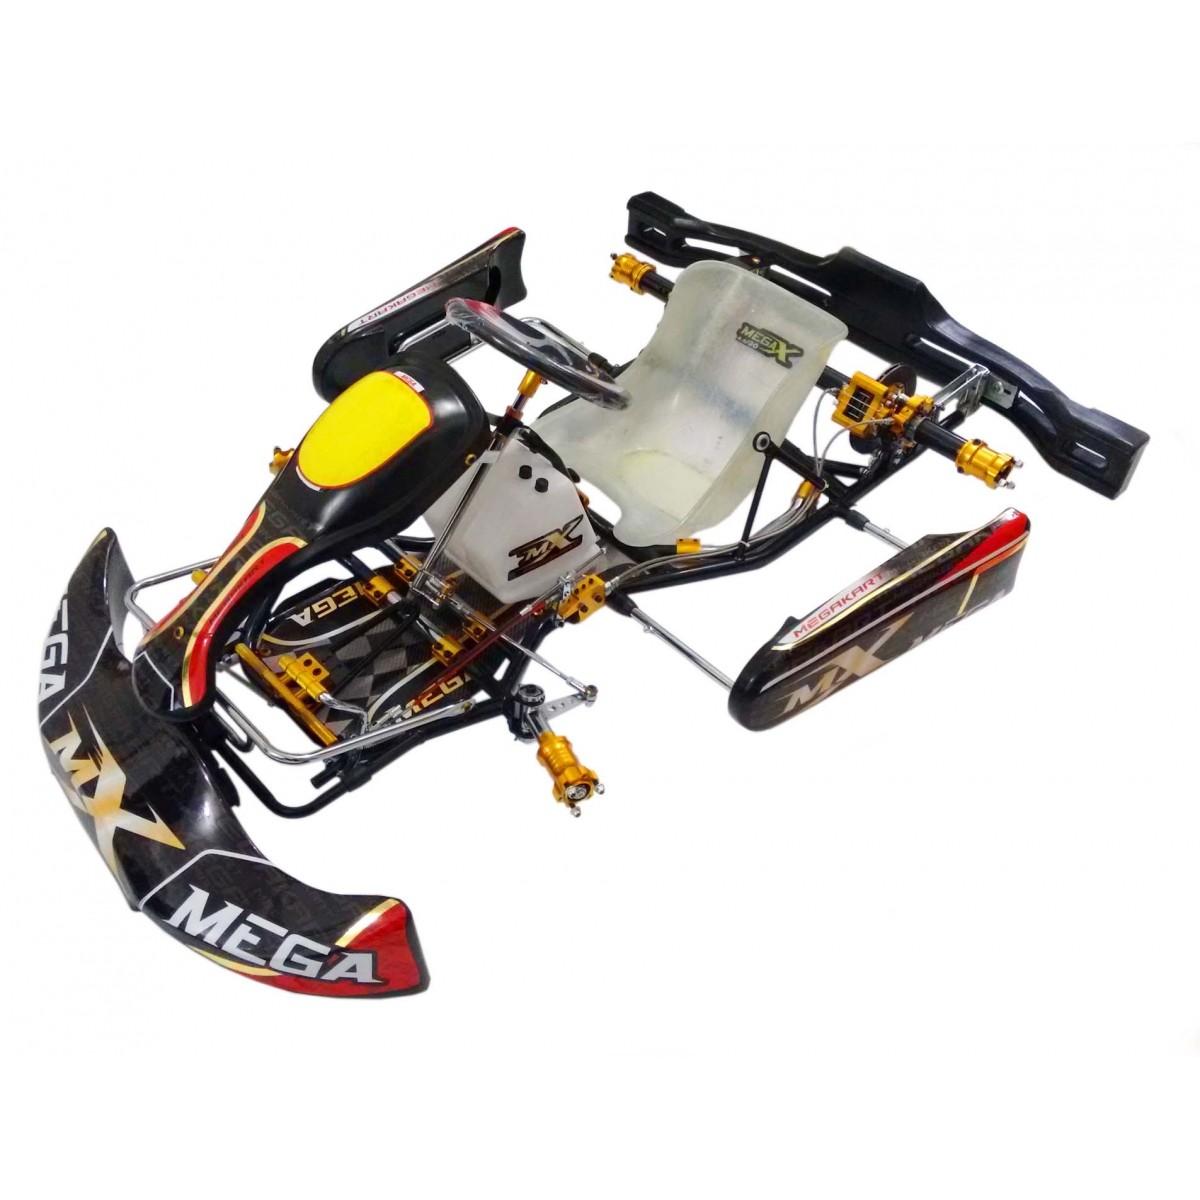 Kart Black Gold (Mangão e Sistema Linear)  - 867